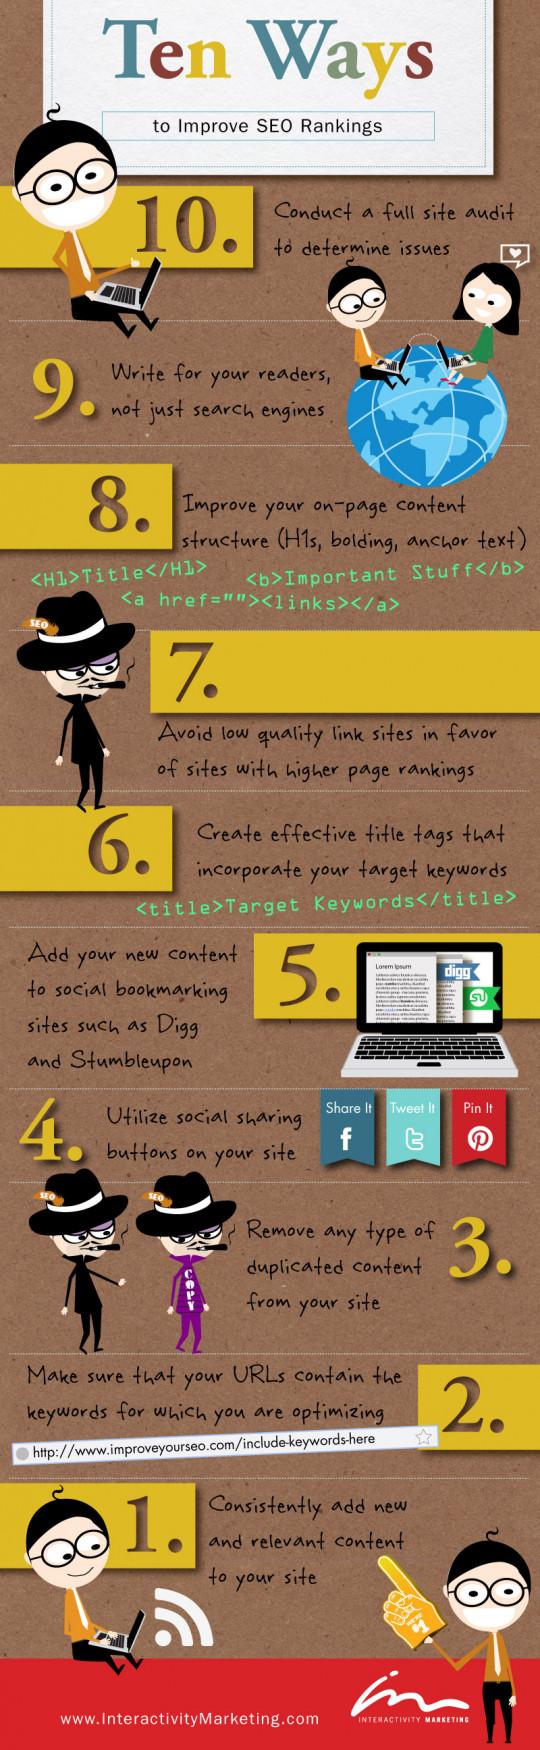 Ten Ways to Improve SEO Rankings